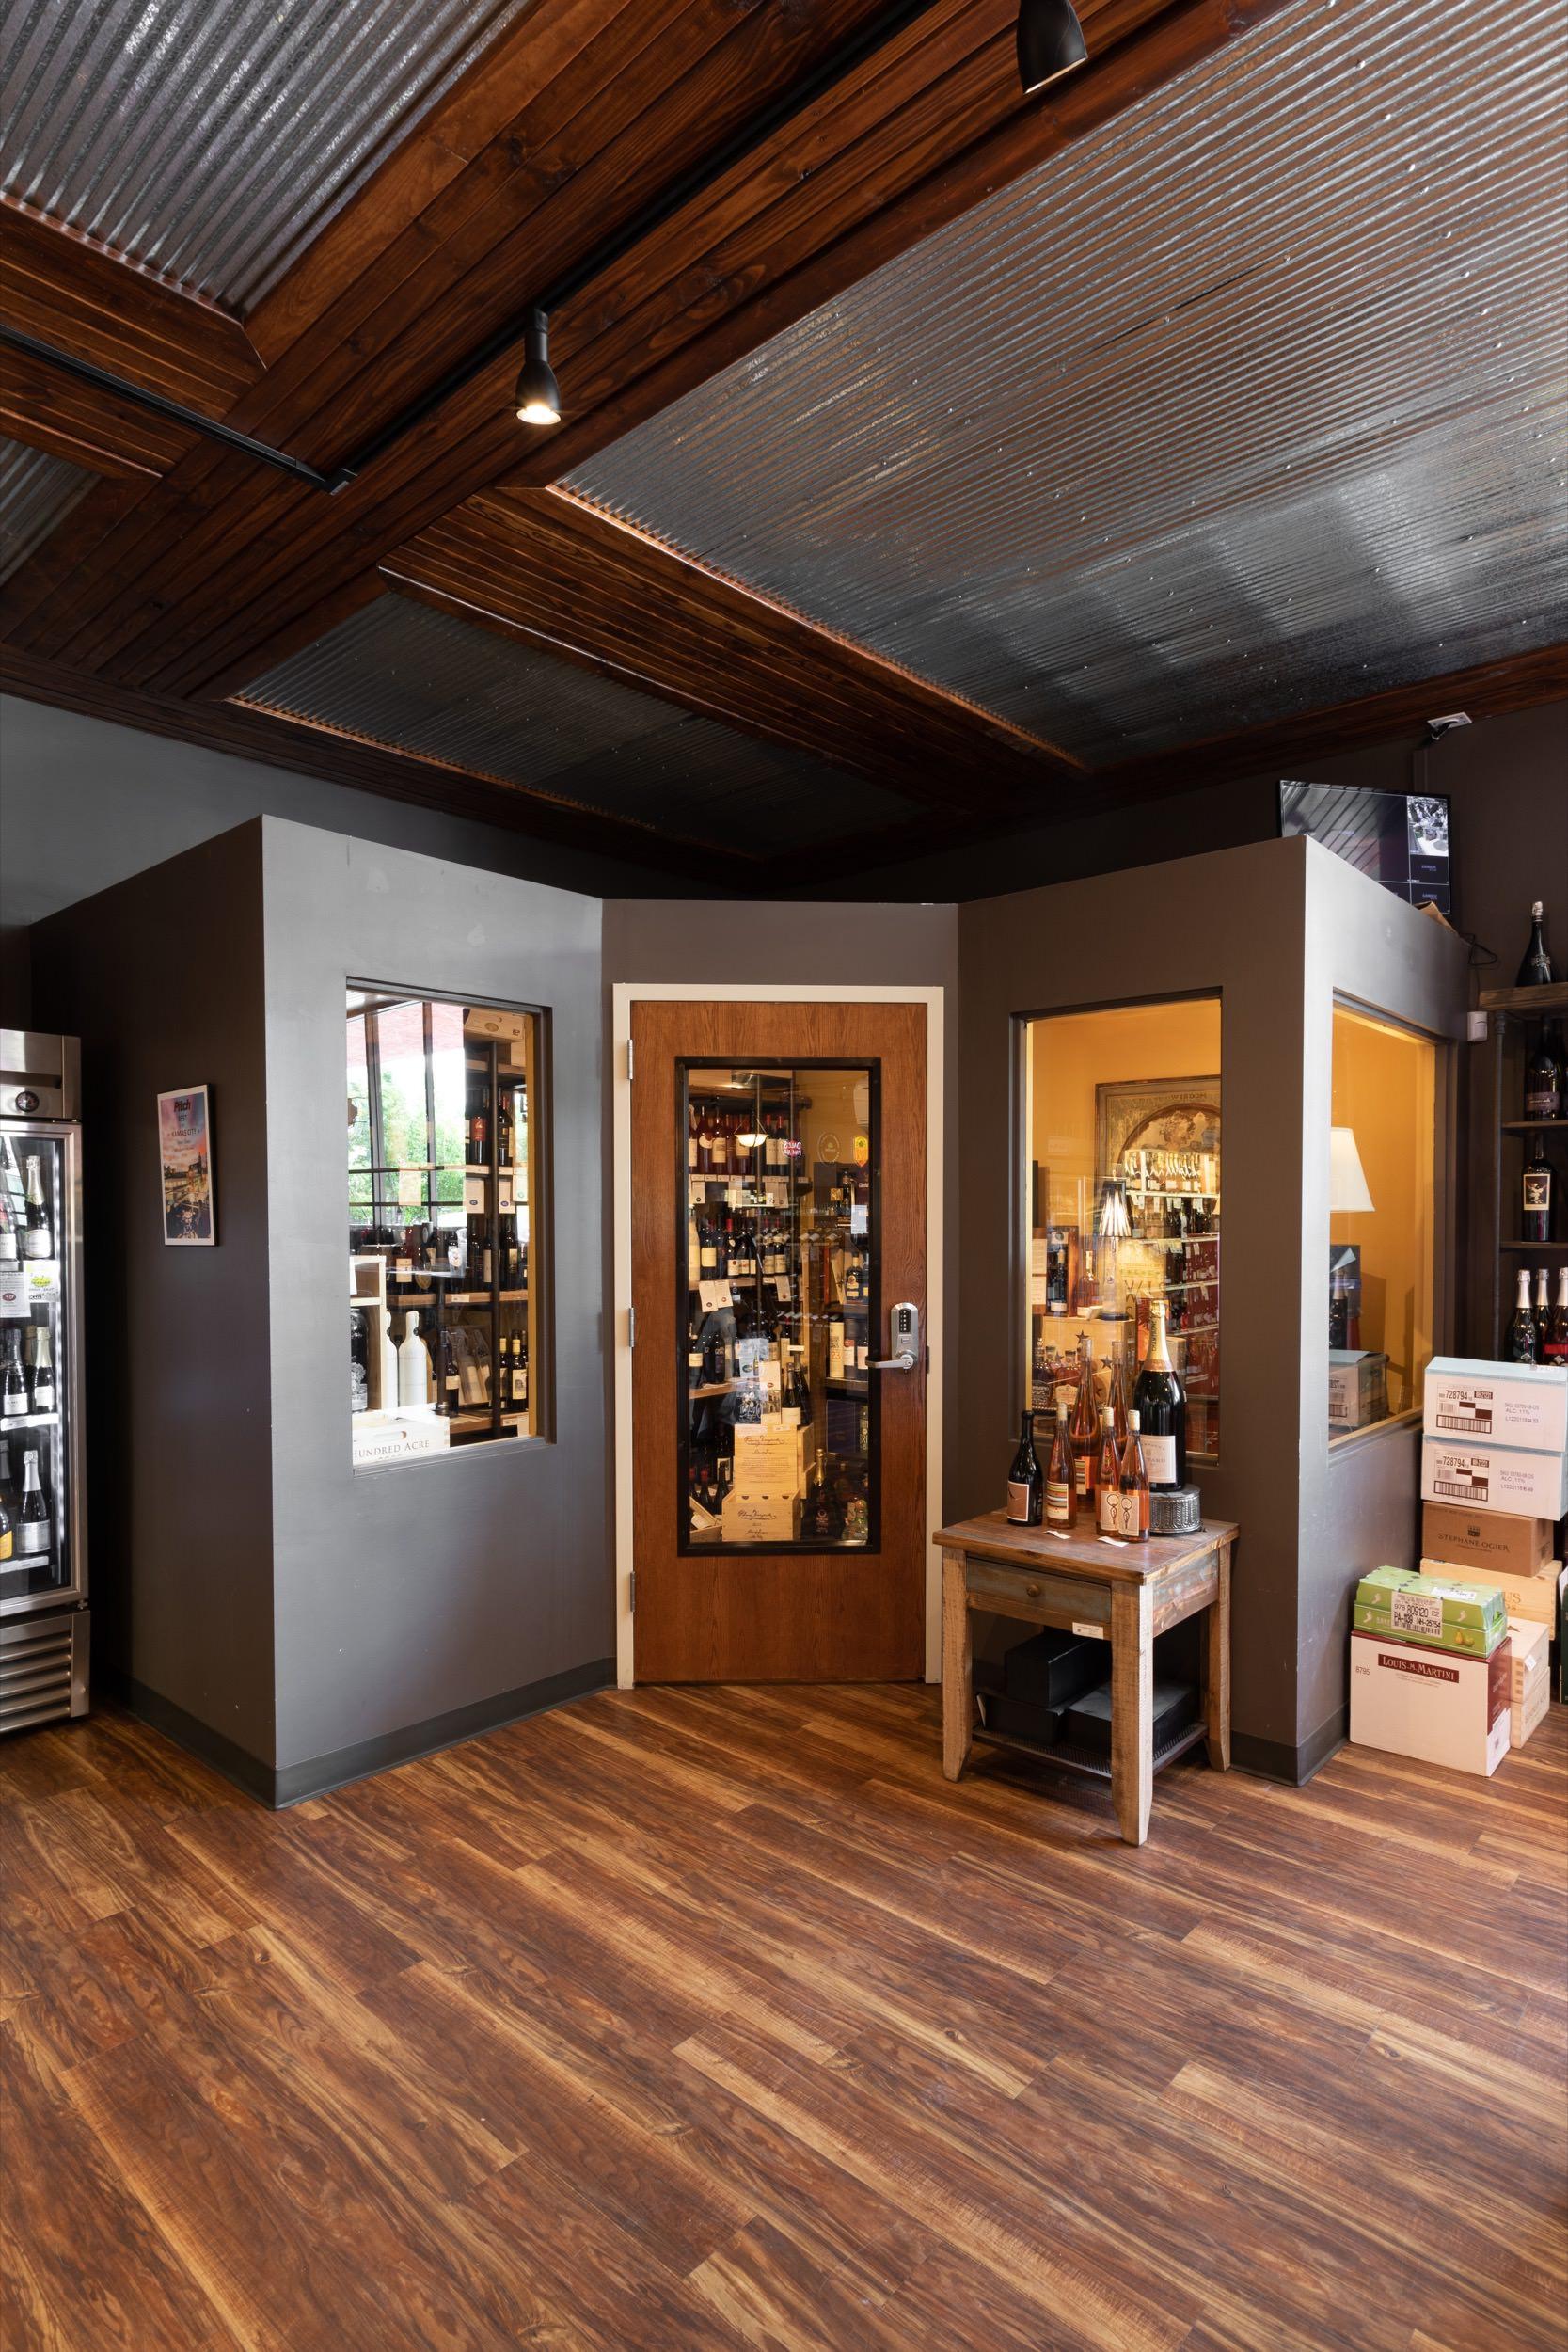 Wine cellar at Plaza Liquors